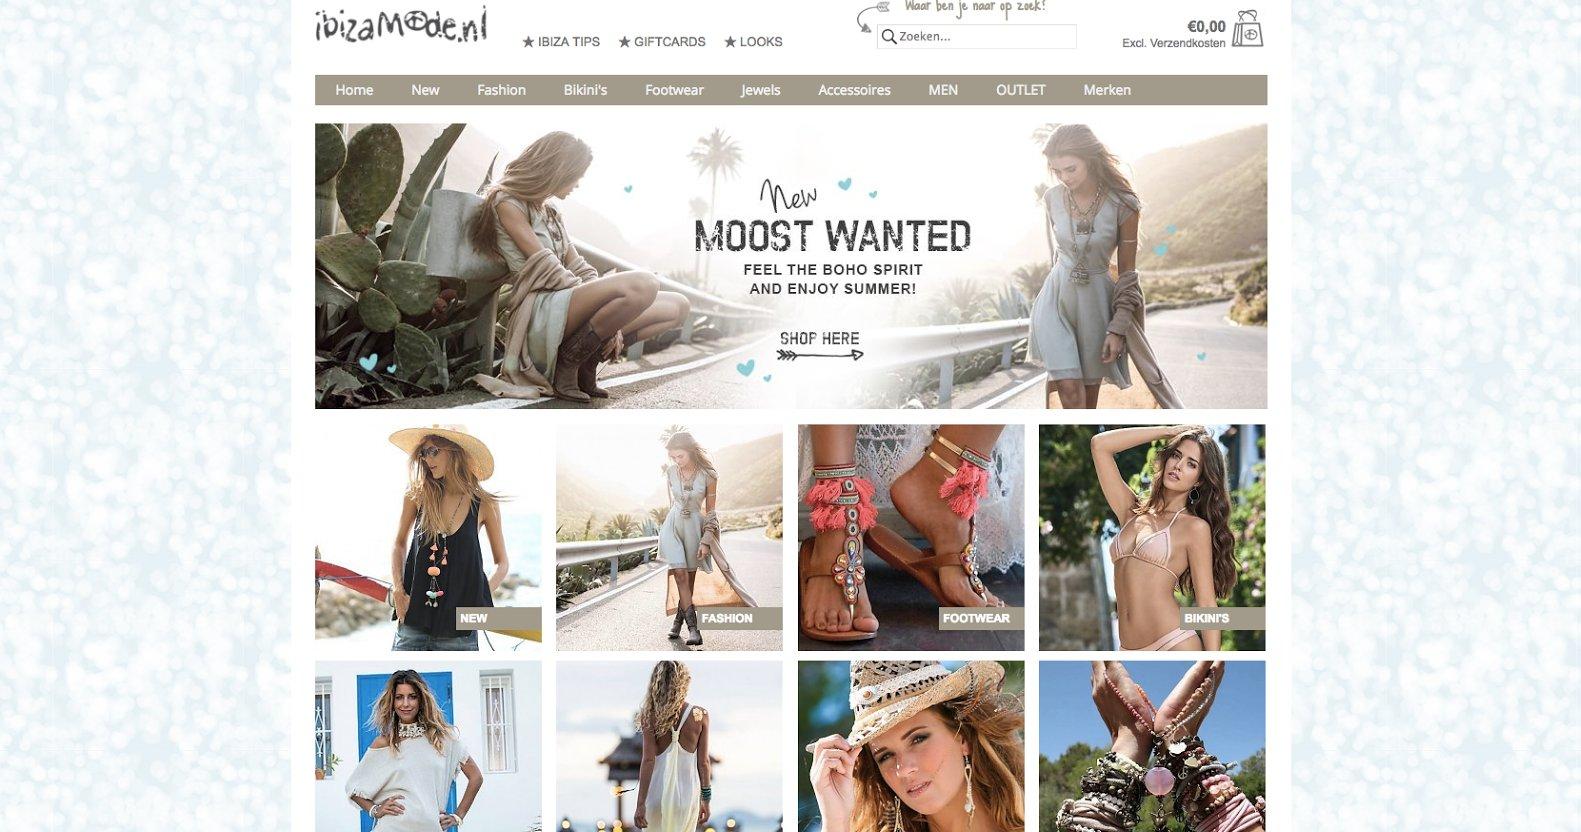 Landingspagina van fashion webshop Ibiza Mode